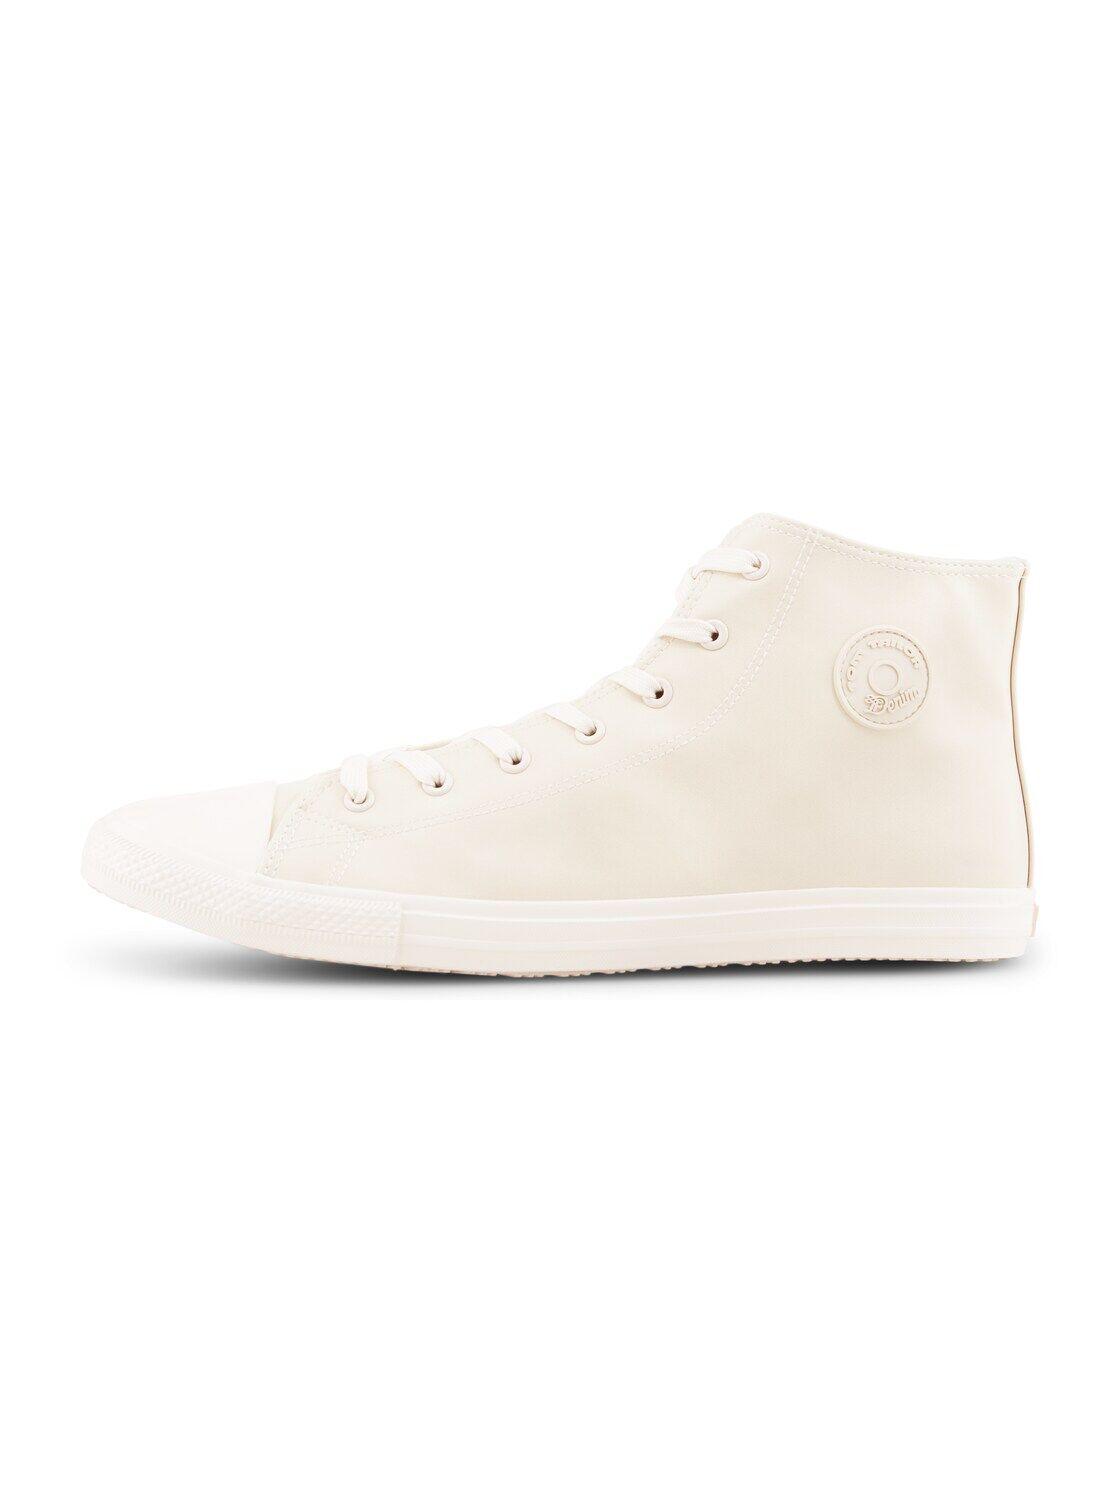 TOM TAILOR DENIM Herren Basic High Top Sneaker, weiß, Gr.45